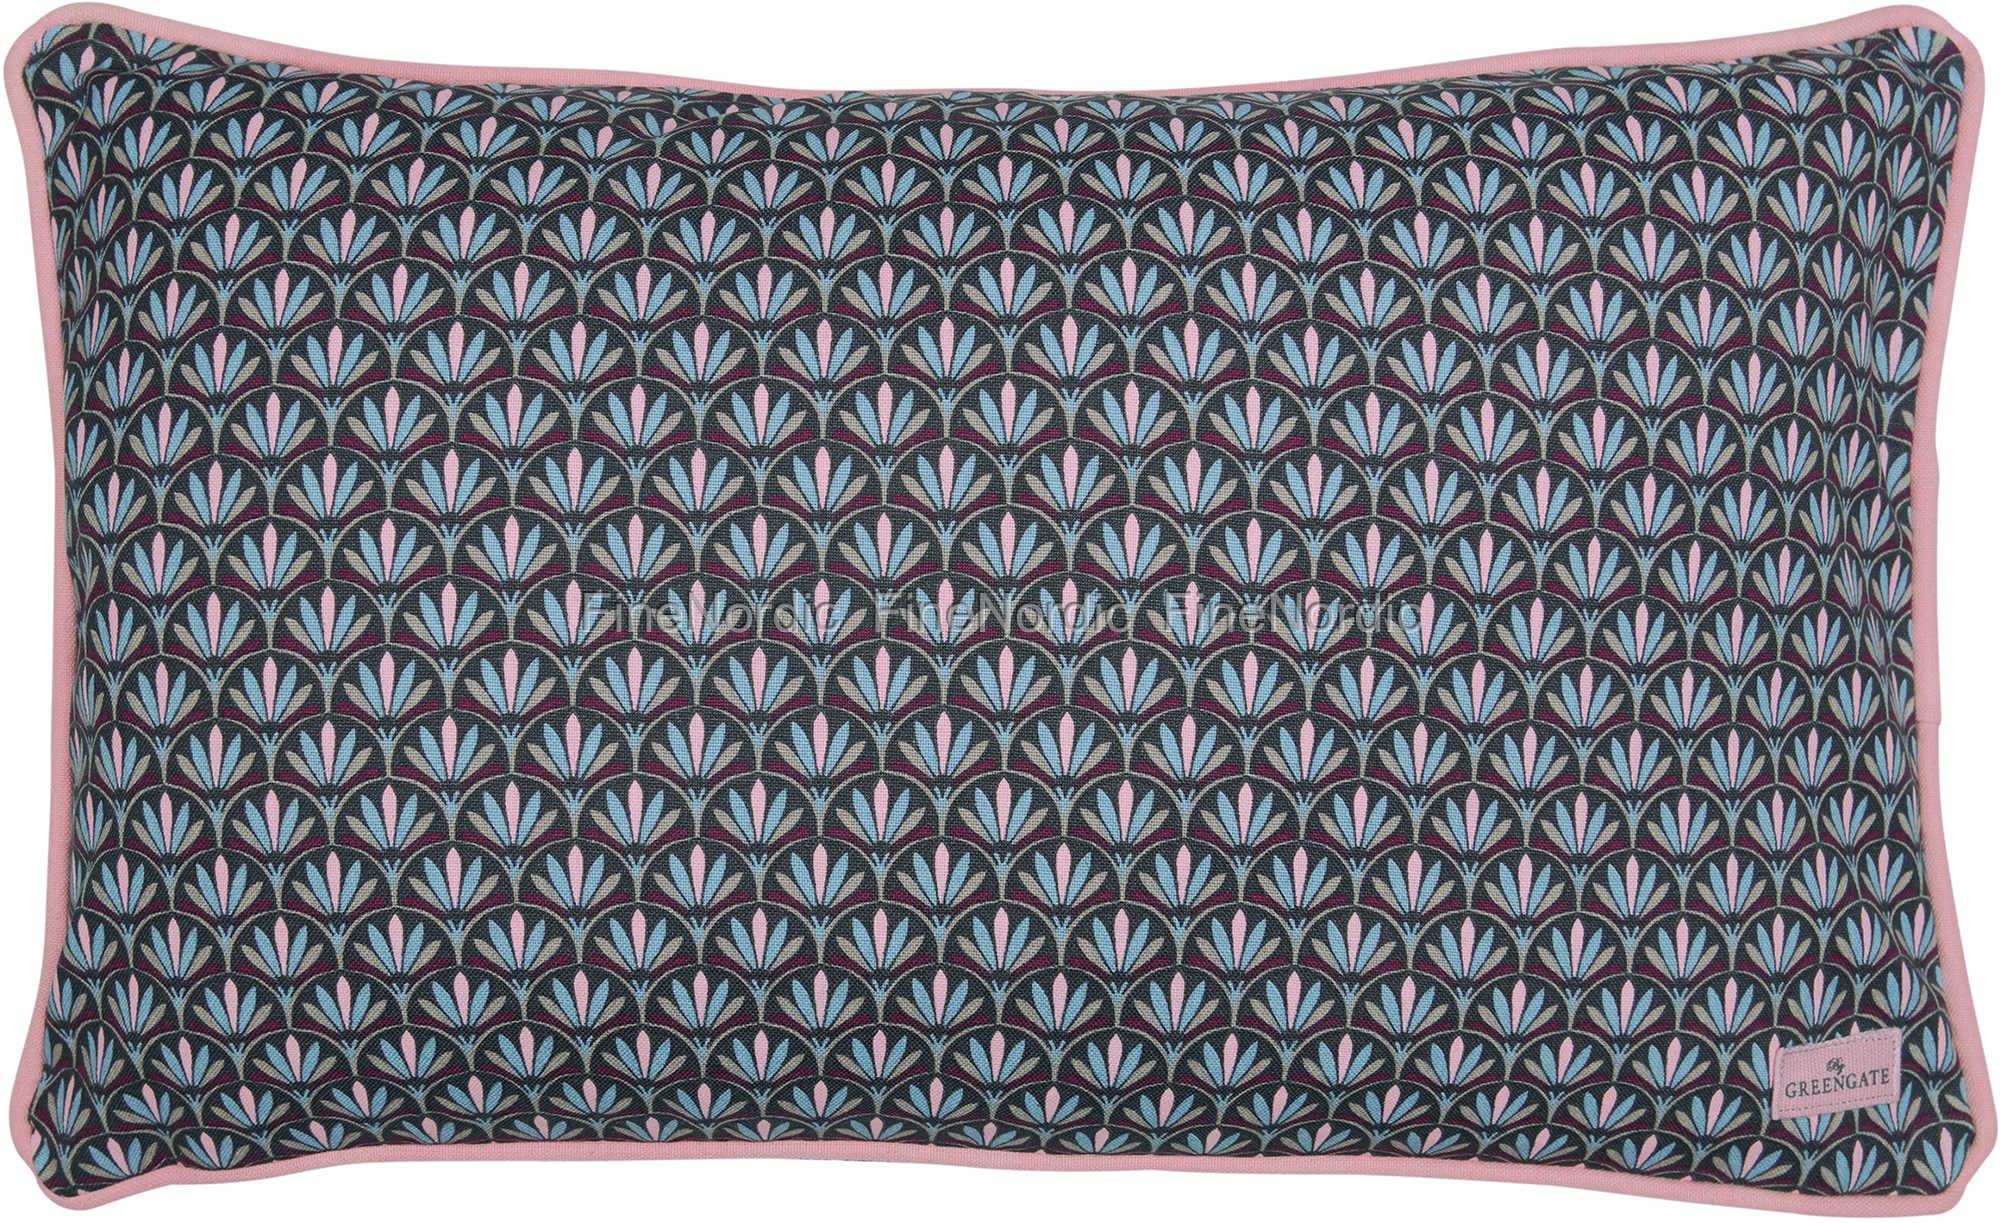 greengate kuddfodral cushion victoria dark grey 30 x 50 cm. Black Bedroom Furniture Sets. Home Design Ideas